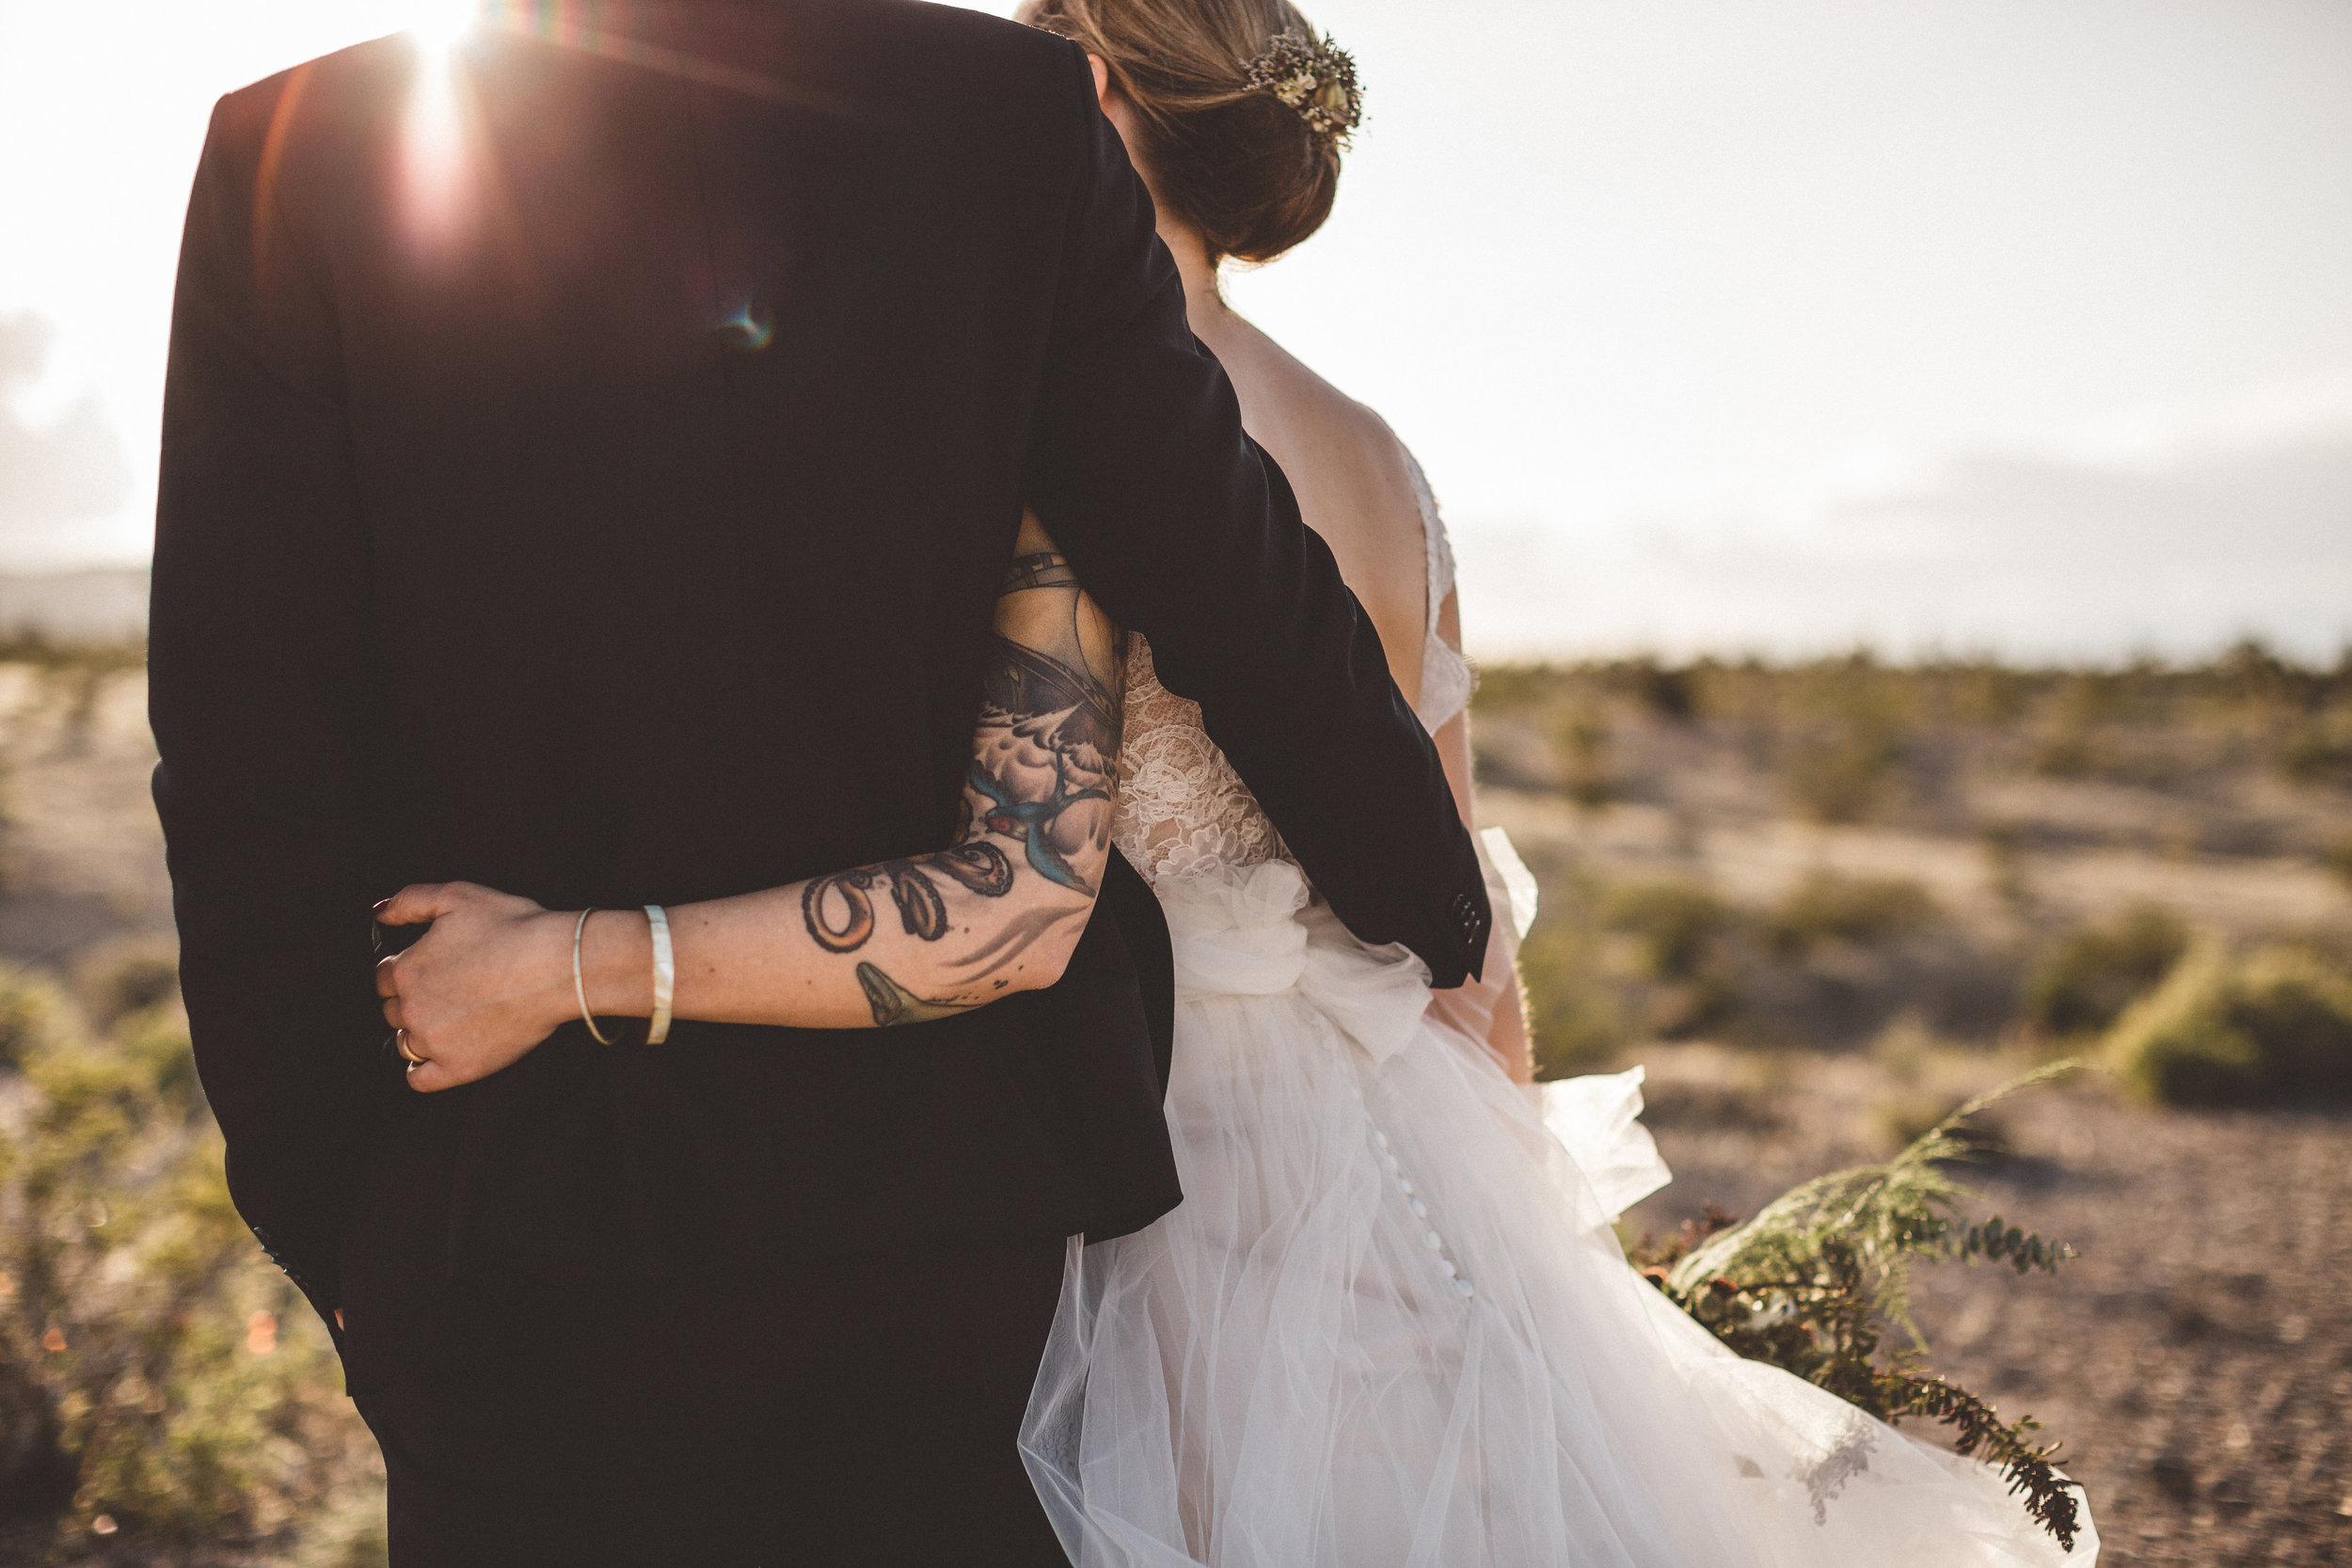 meike-and-rene-las-vegas-desert-elopement14.jpg